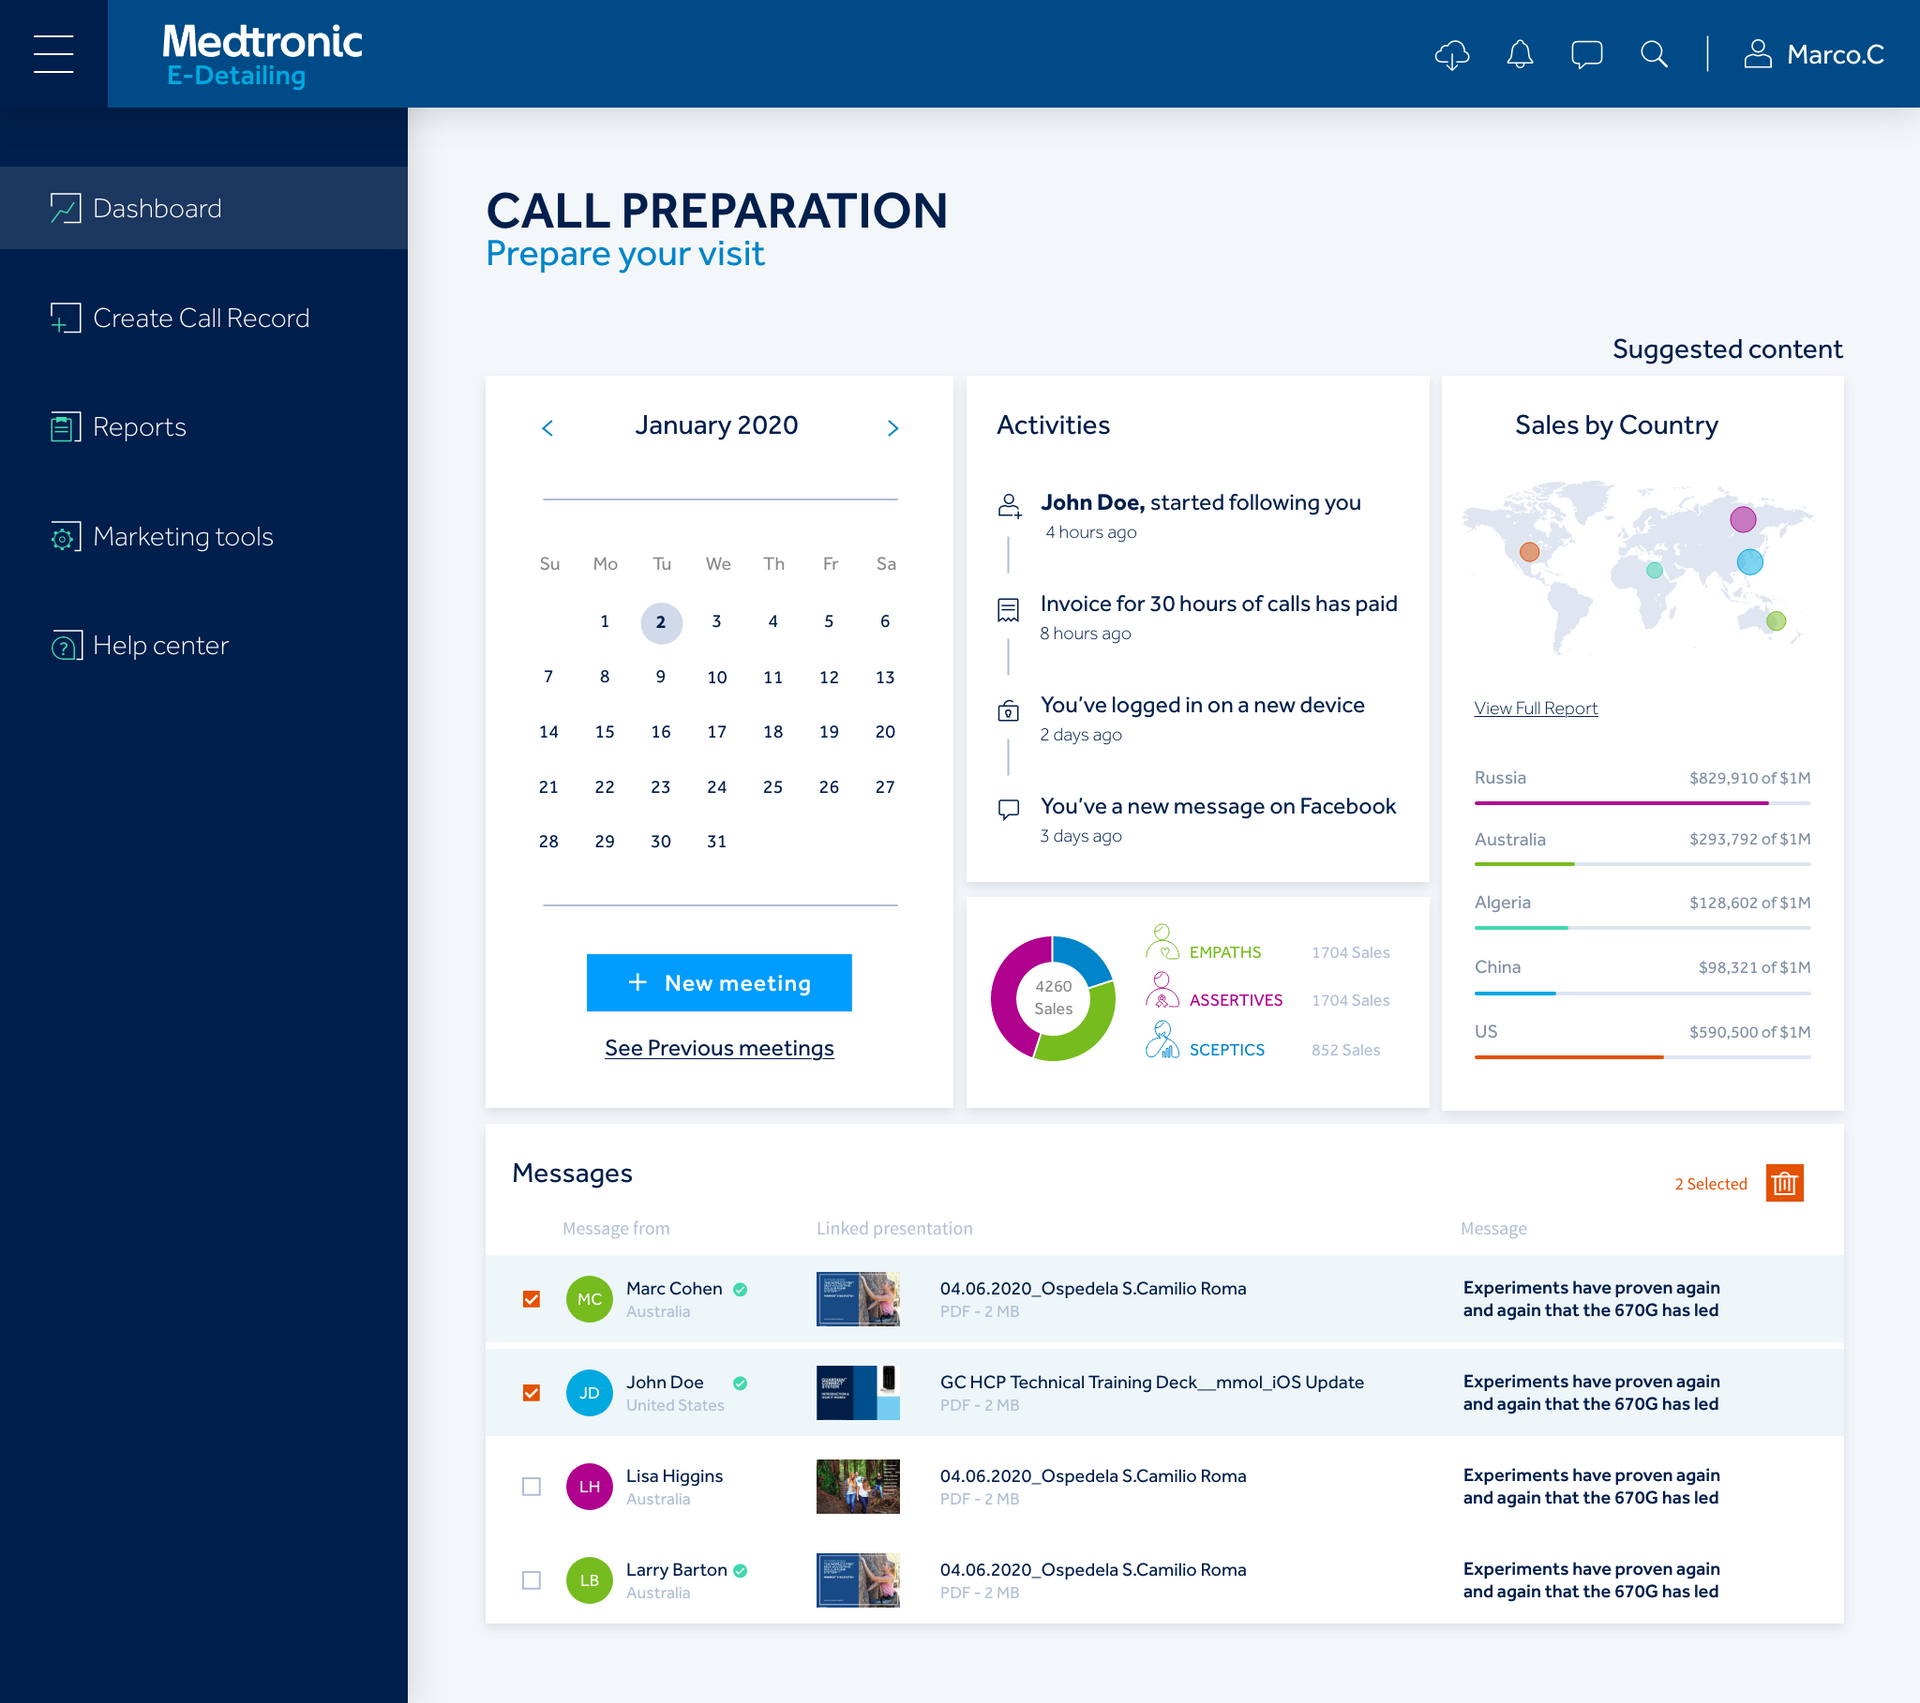 Call_Preparation